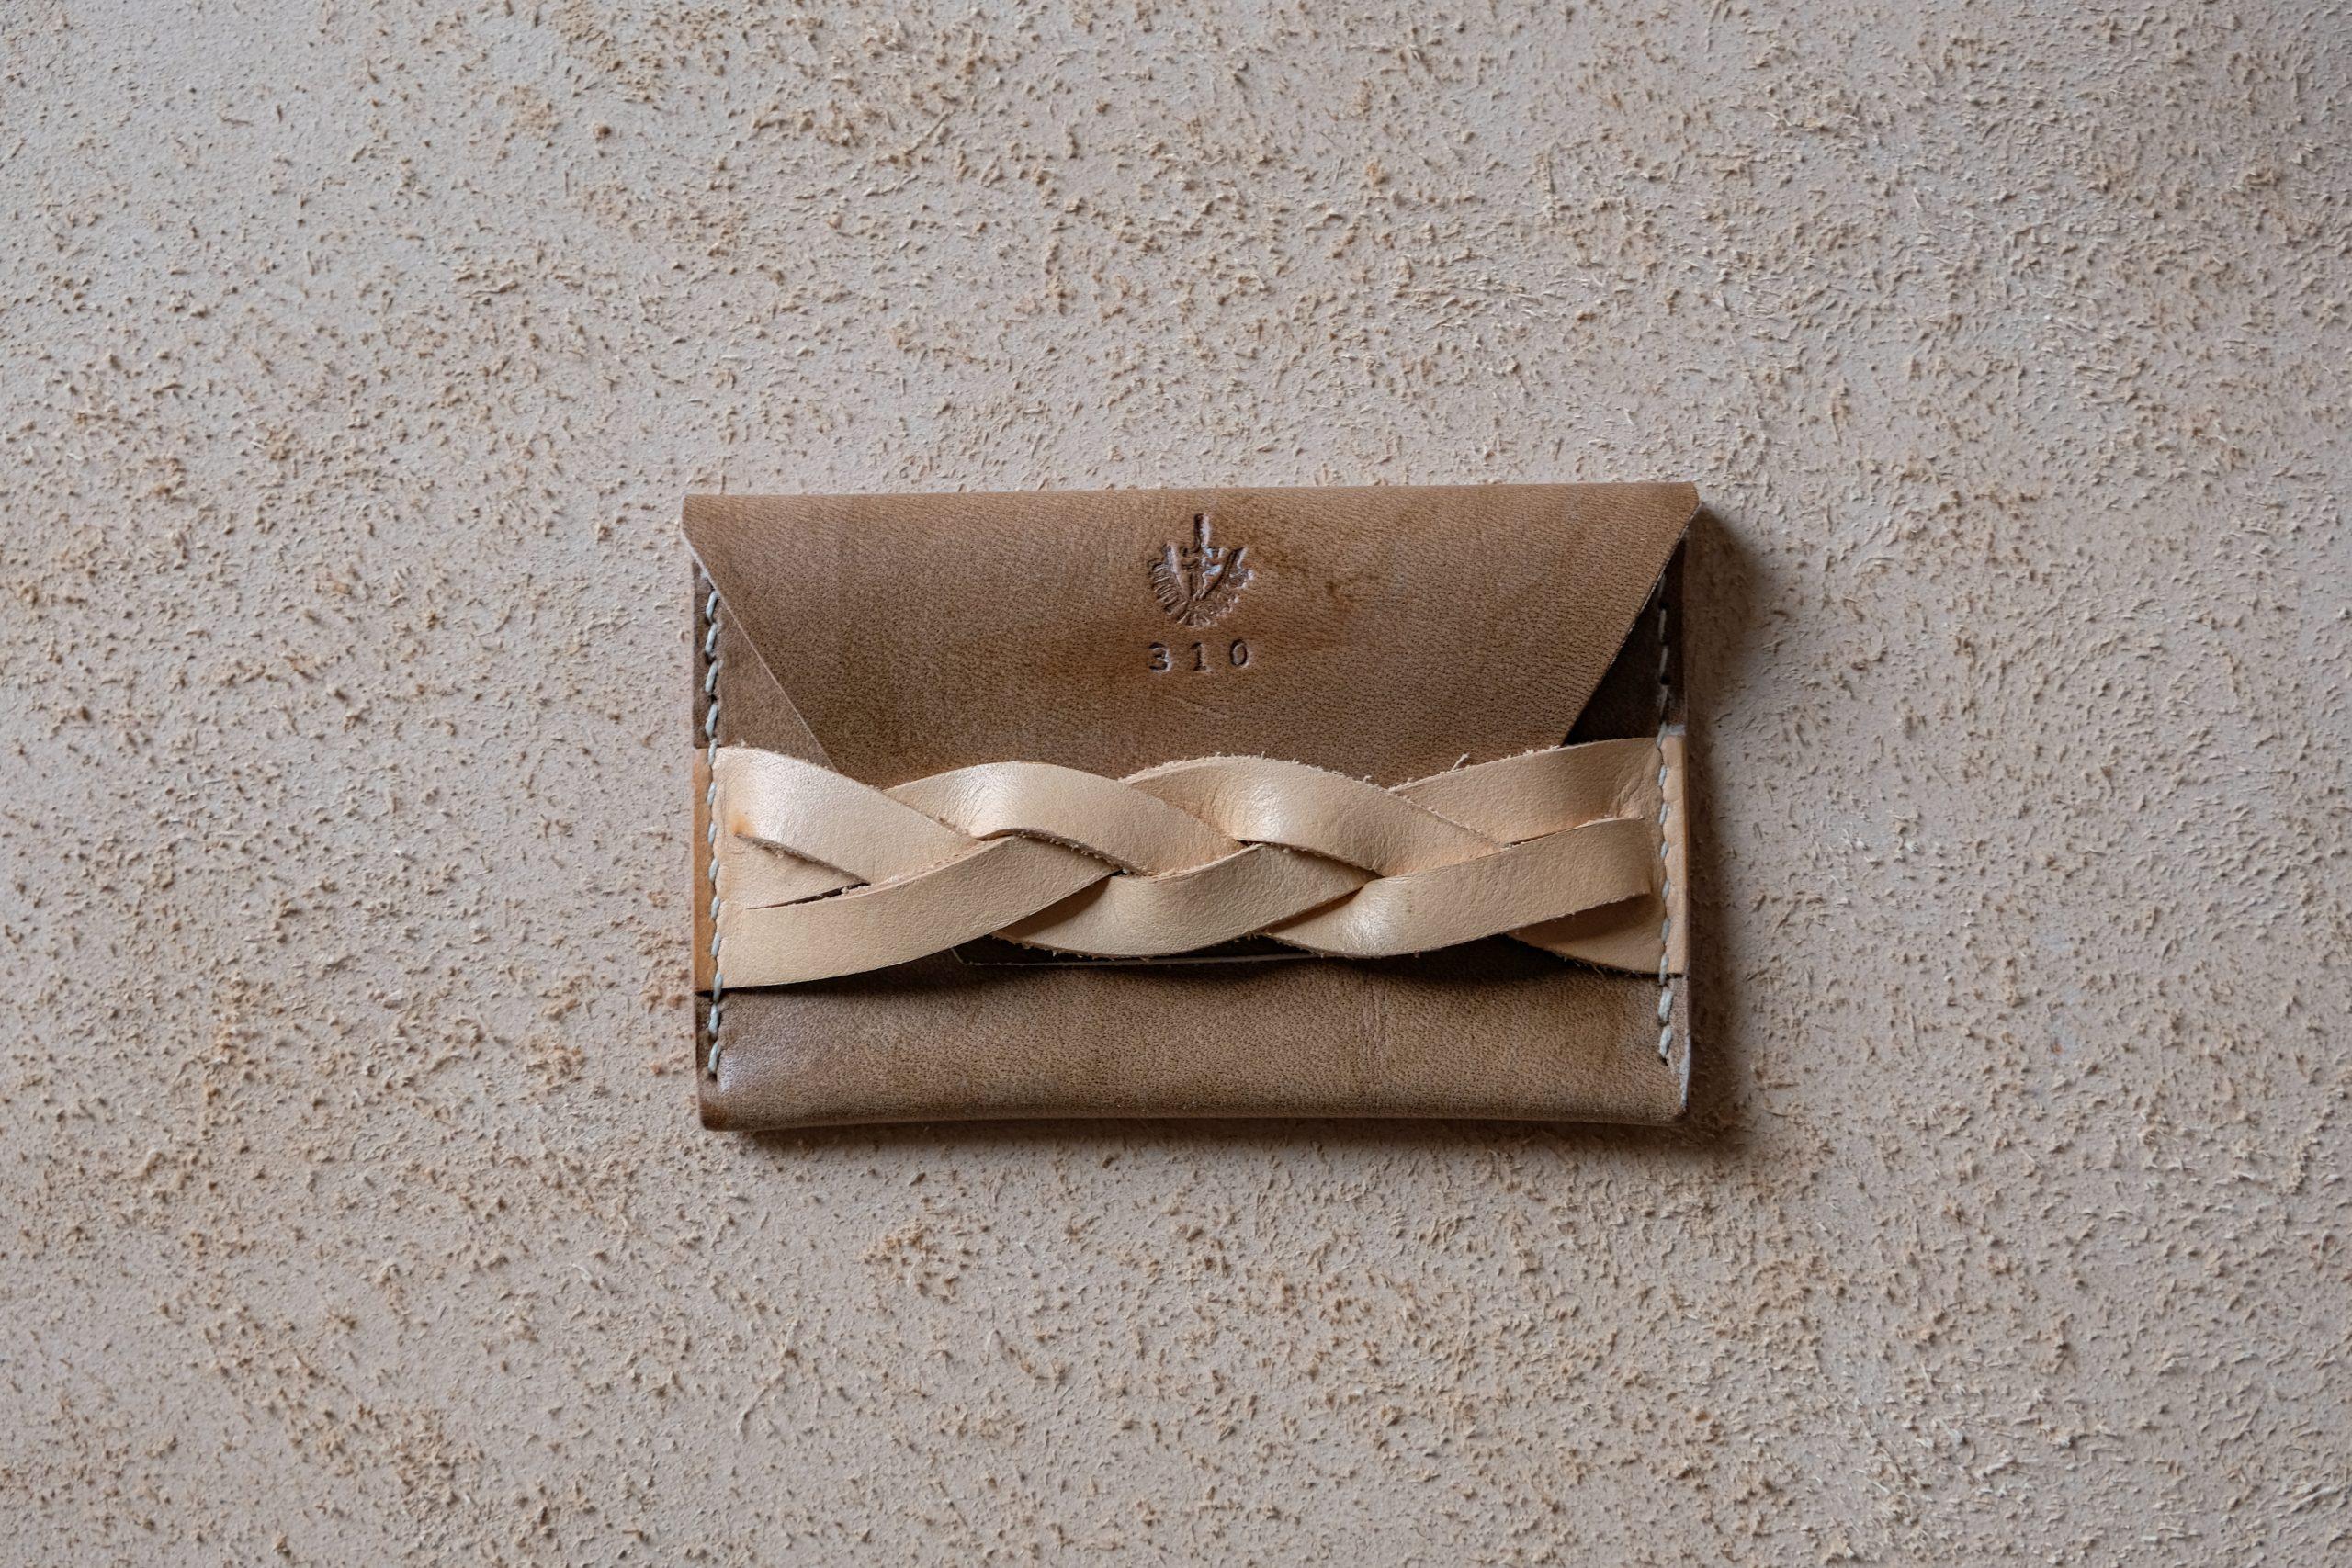 lerif designs leather magic braid cardholder walnut and natural on beige background